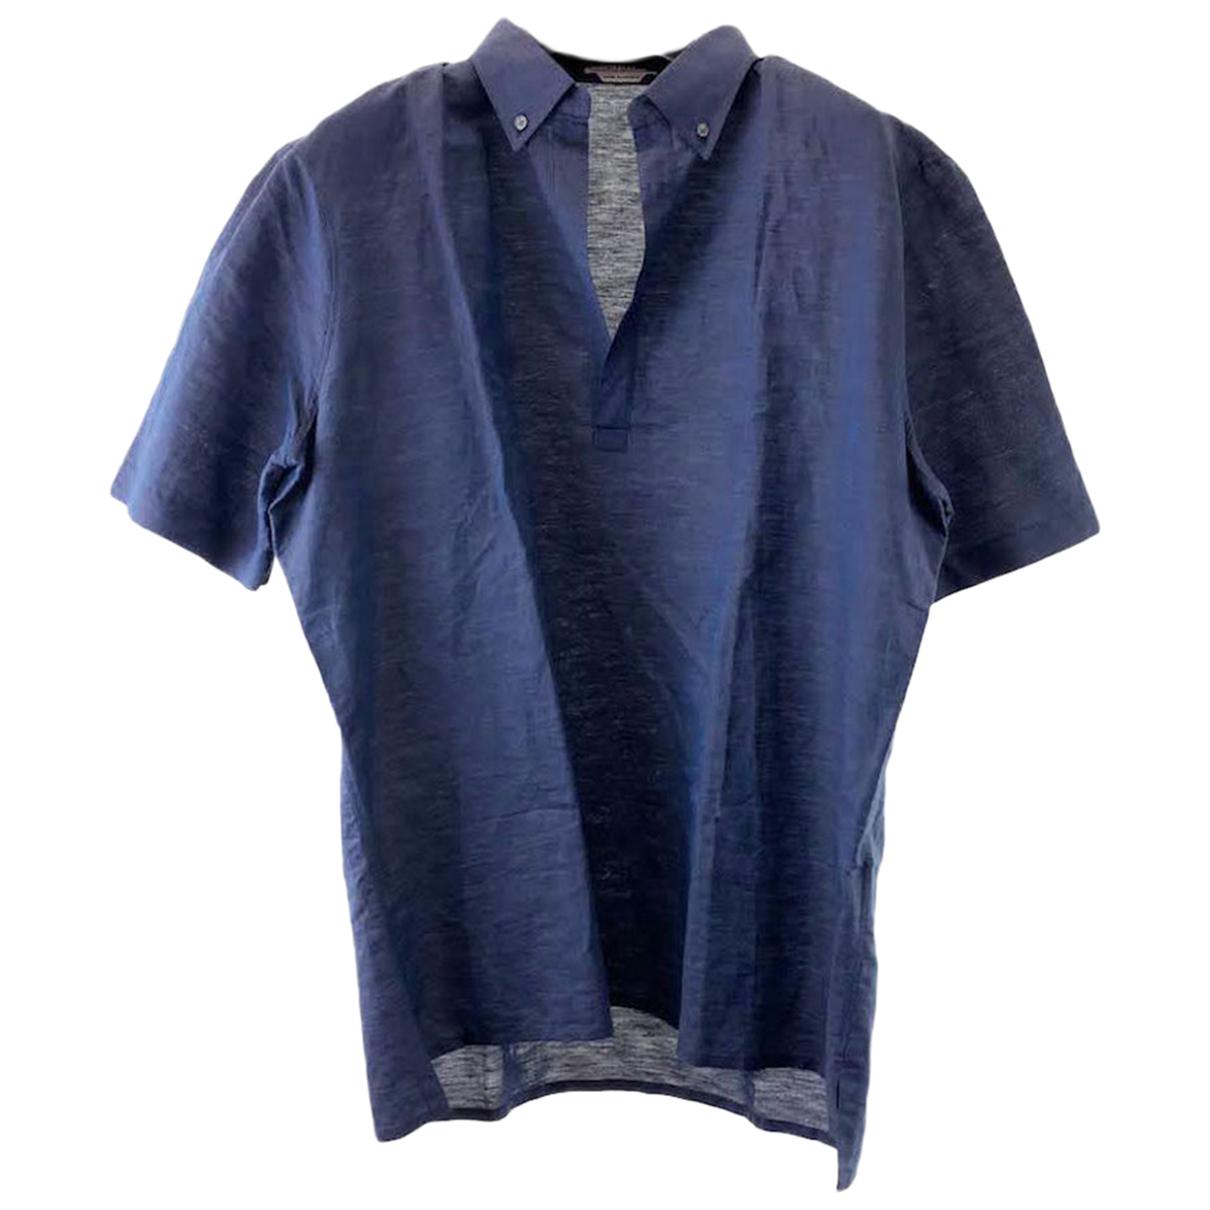 Hermes - Chemises   pour homme en lin - marine